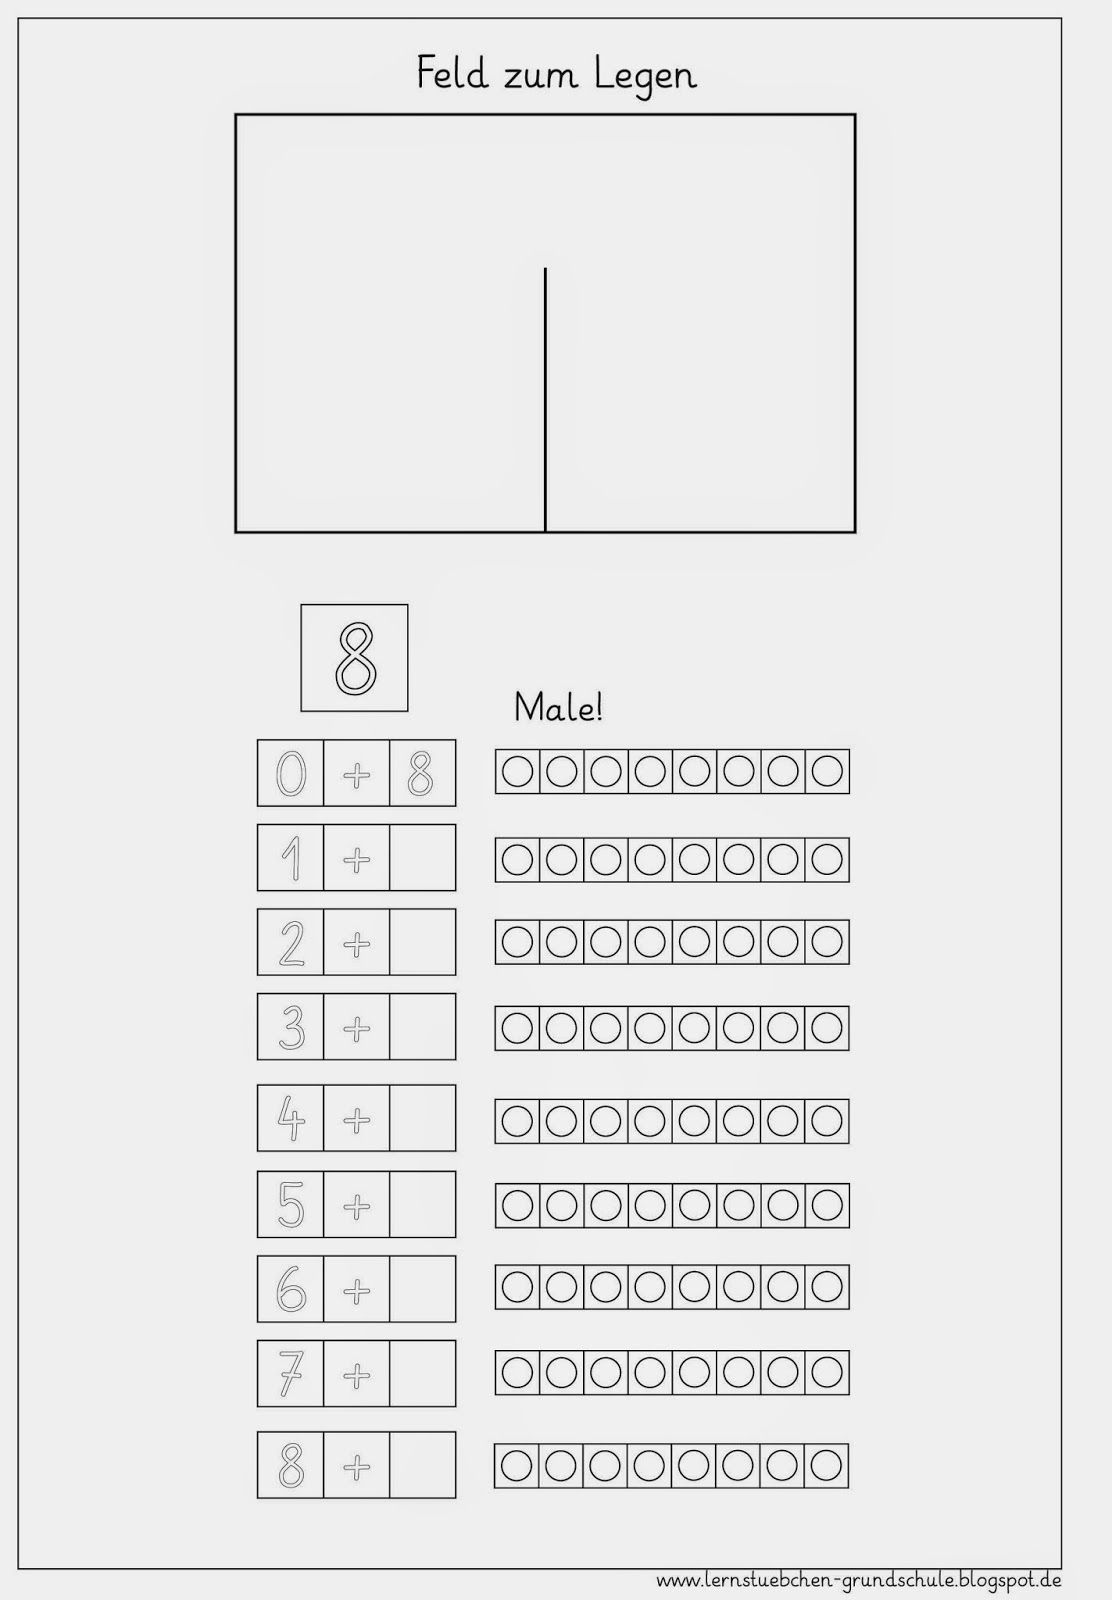 pin by katharina tretropp on schule 1 mathe mathematikunterricht arbeitsbl tter mathe. Black Bedroom Furniture Sets. Home Design Ideas